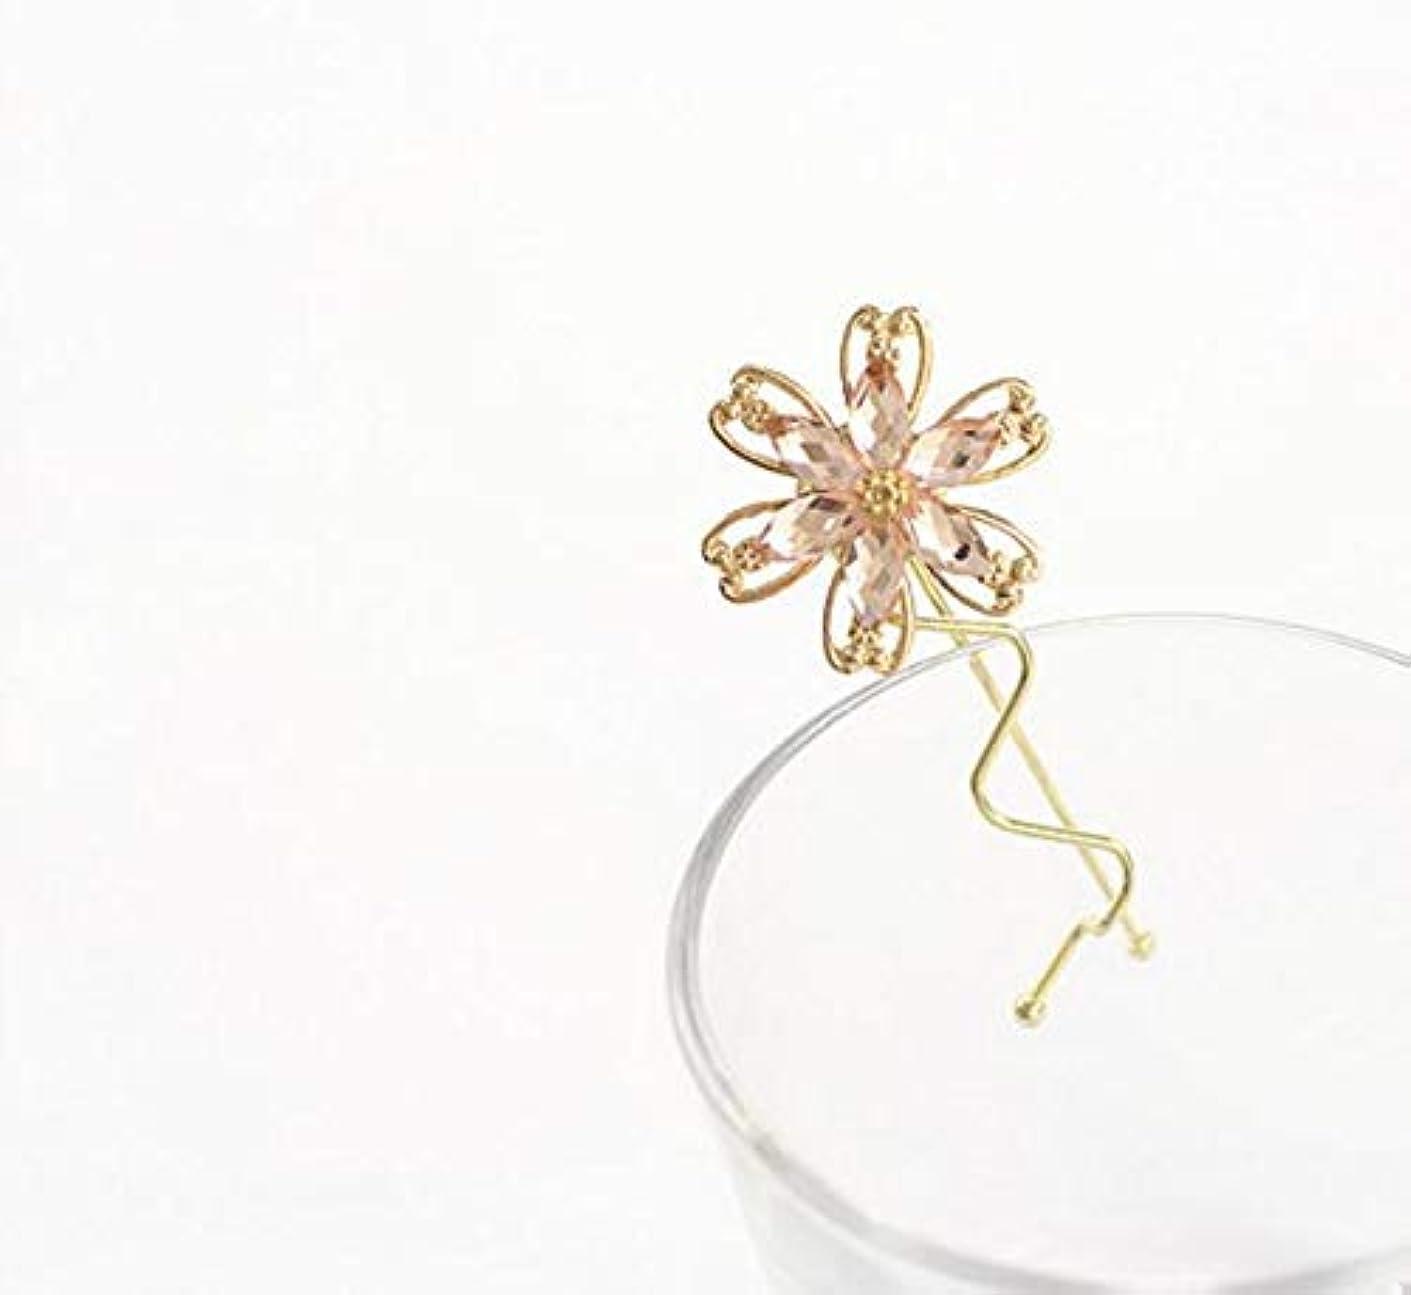 HuaQingPiJu-JP ファッションシンプルな桜のヘッドウェア子供のヘアピン便利なヘアクリップ(ピンク)